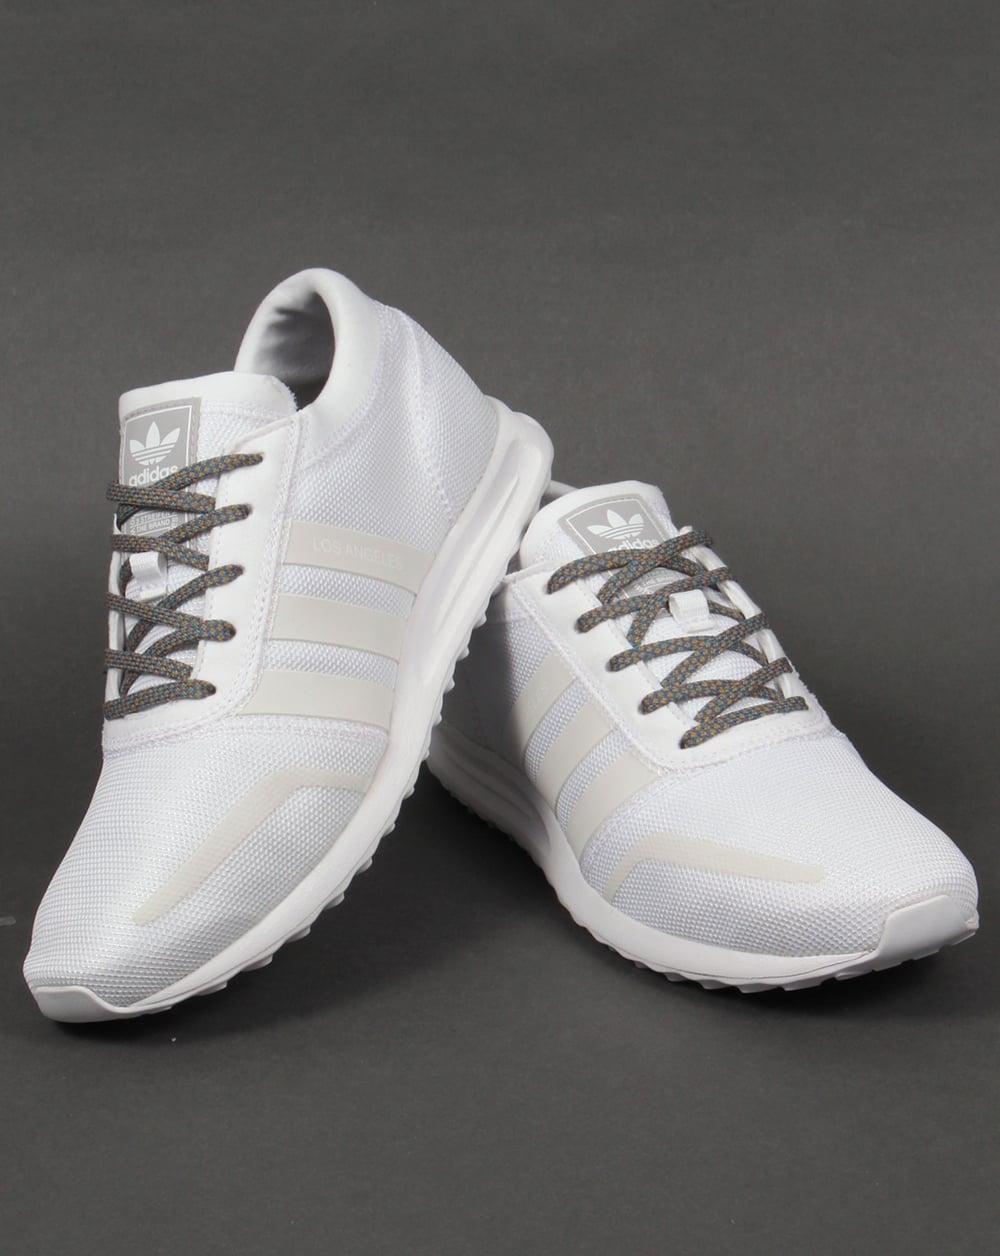 Adidas Los Angeles Trainers White/White/Grey,originals ...